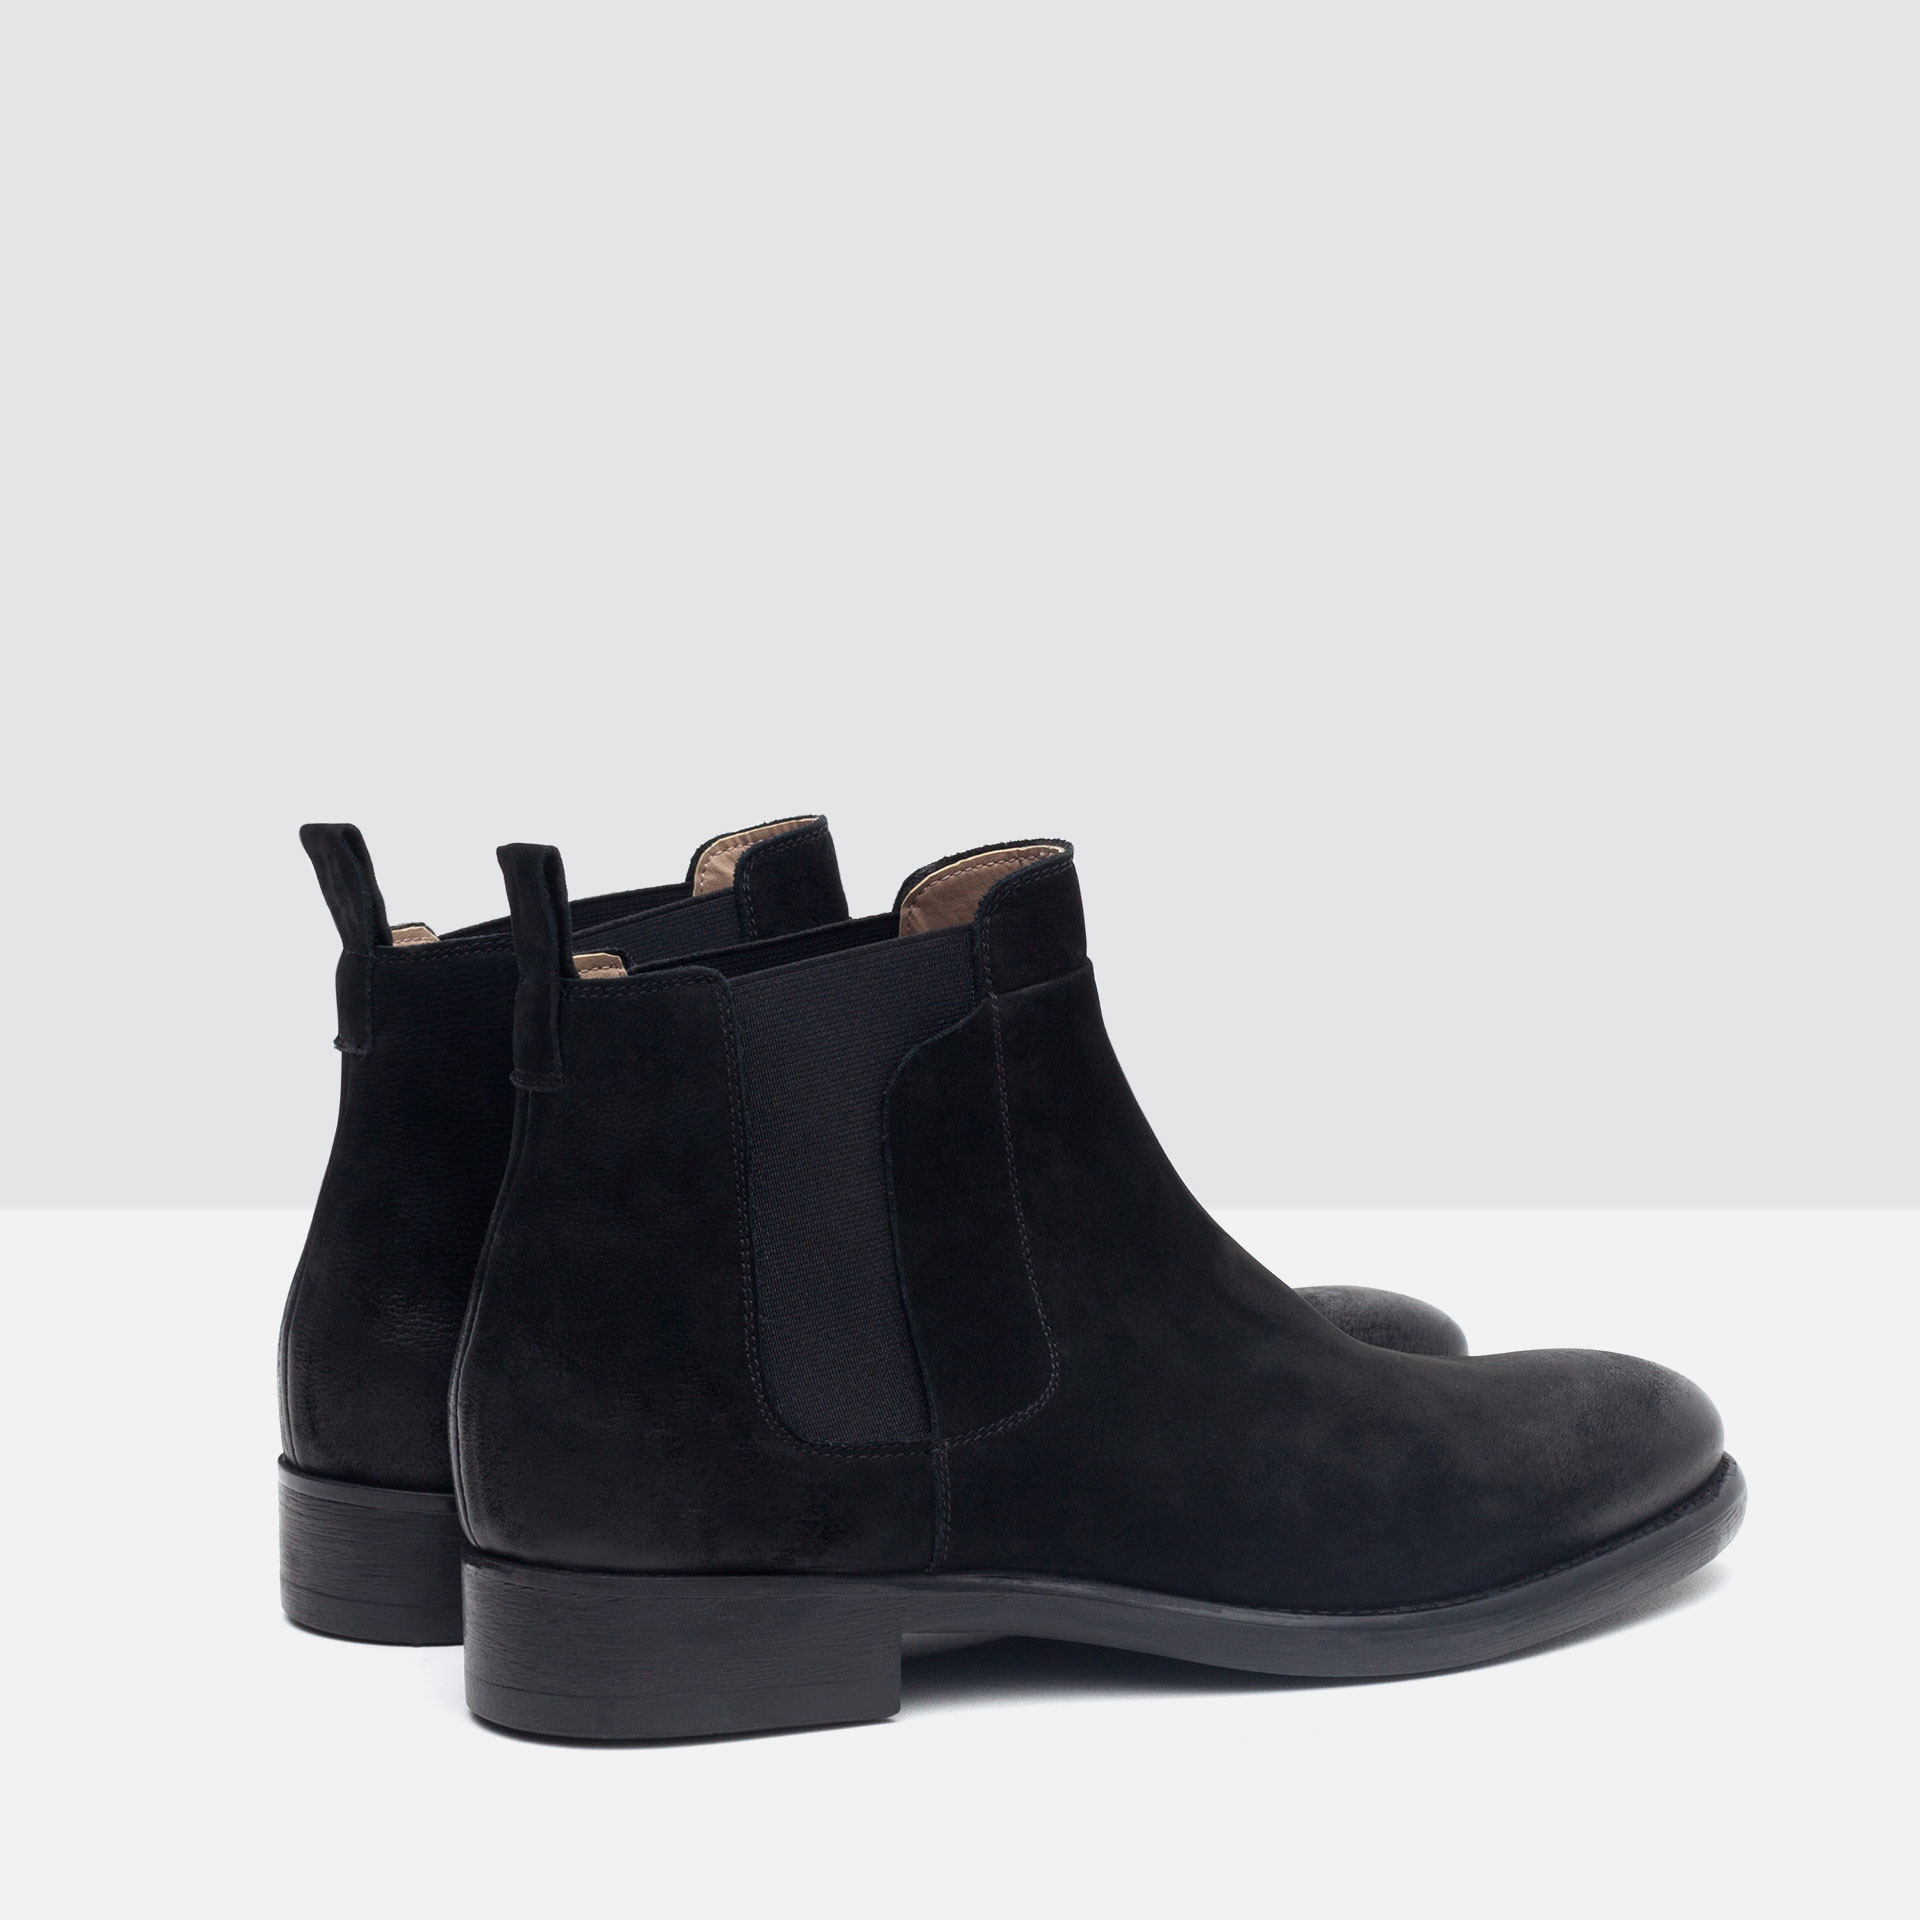 Zara Mens Suede Shoes